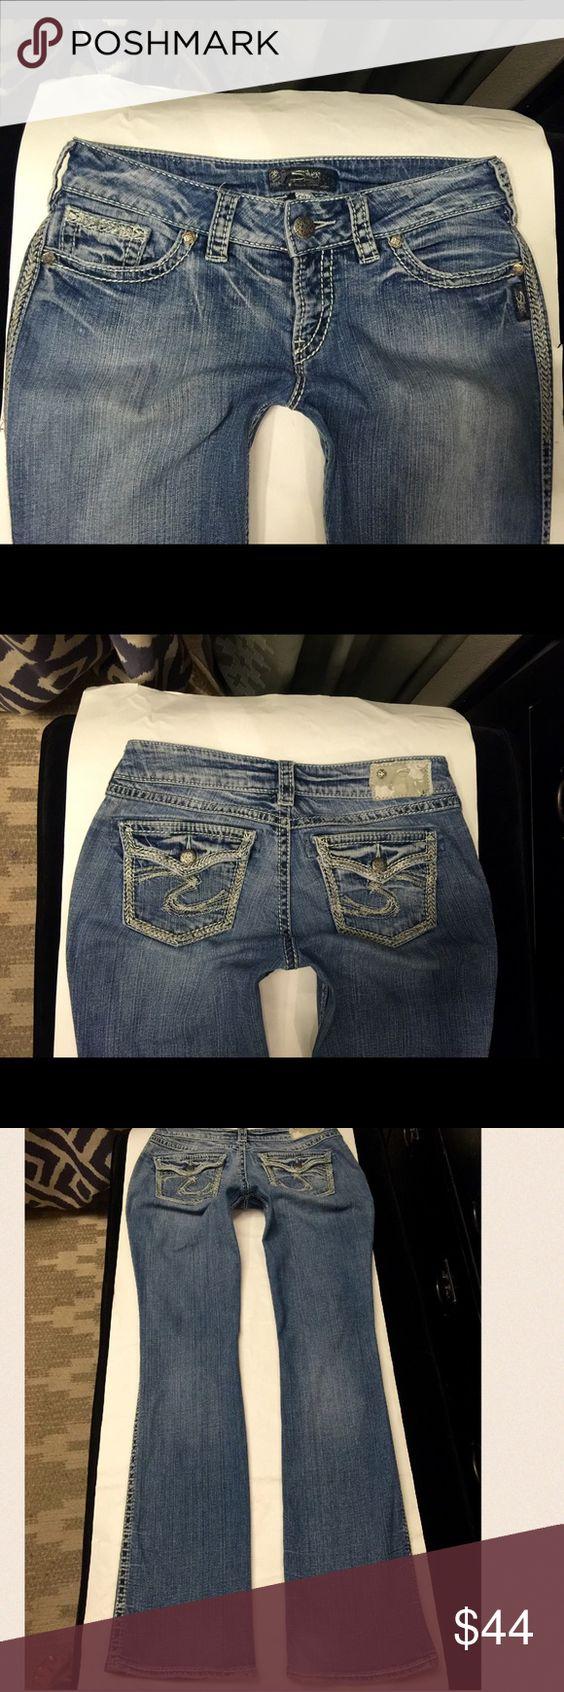 Silver Brand denim jeans SUKI SURPLUS size 29 | Silver jeans Jean